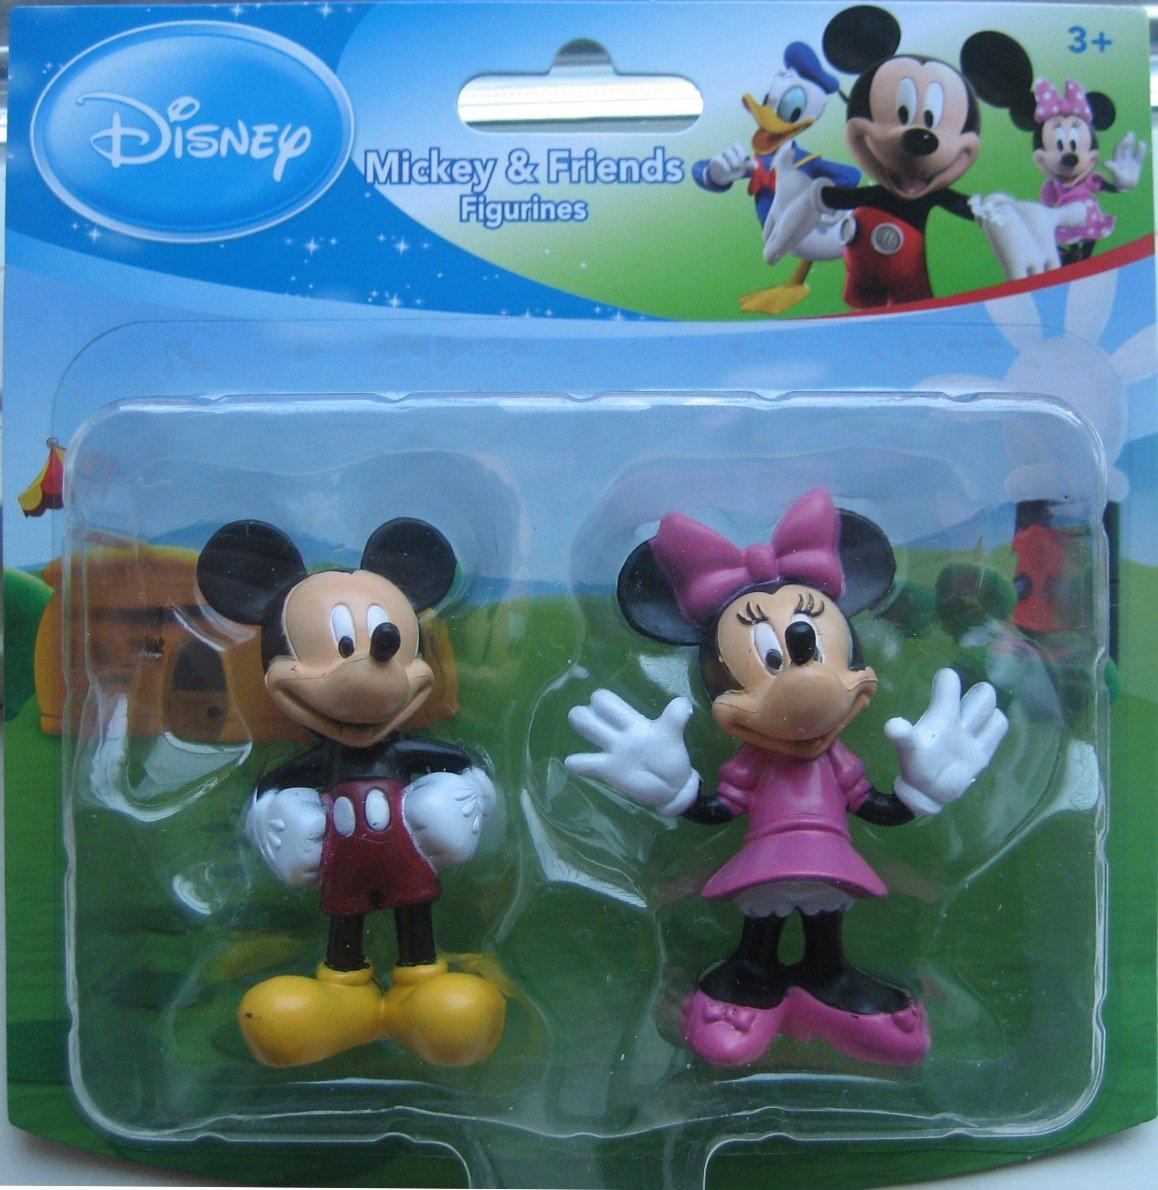 Disney Mickey Friends Mickey & Minnie Mouse